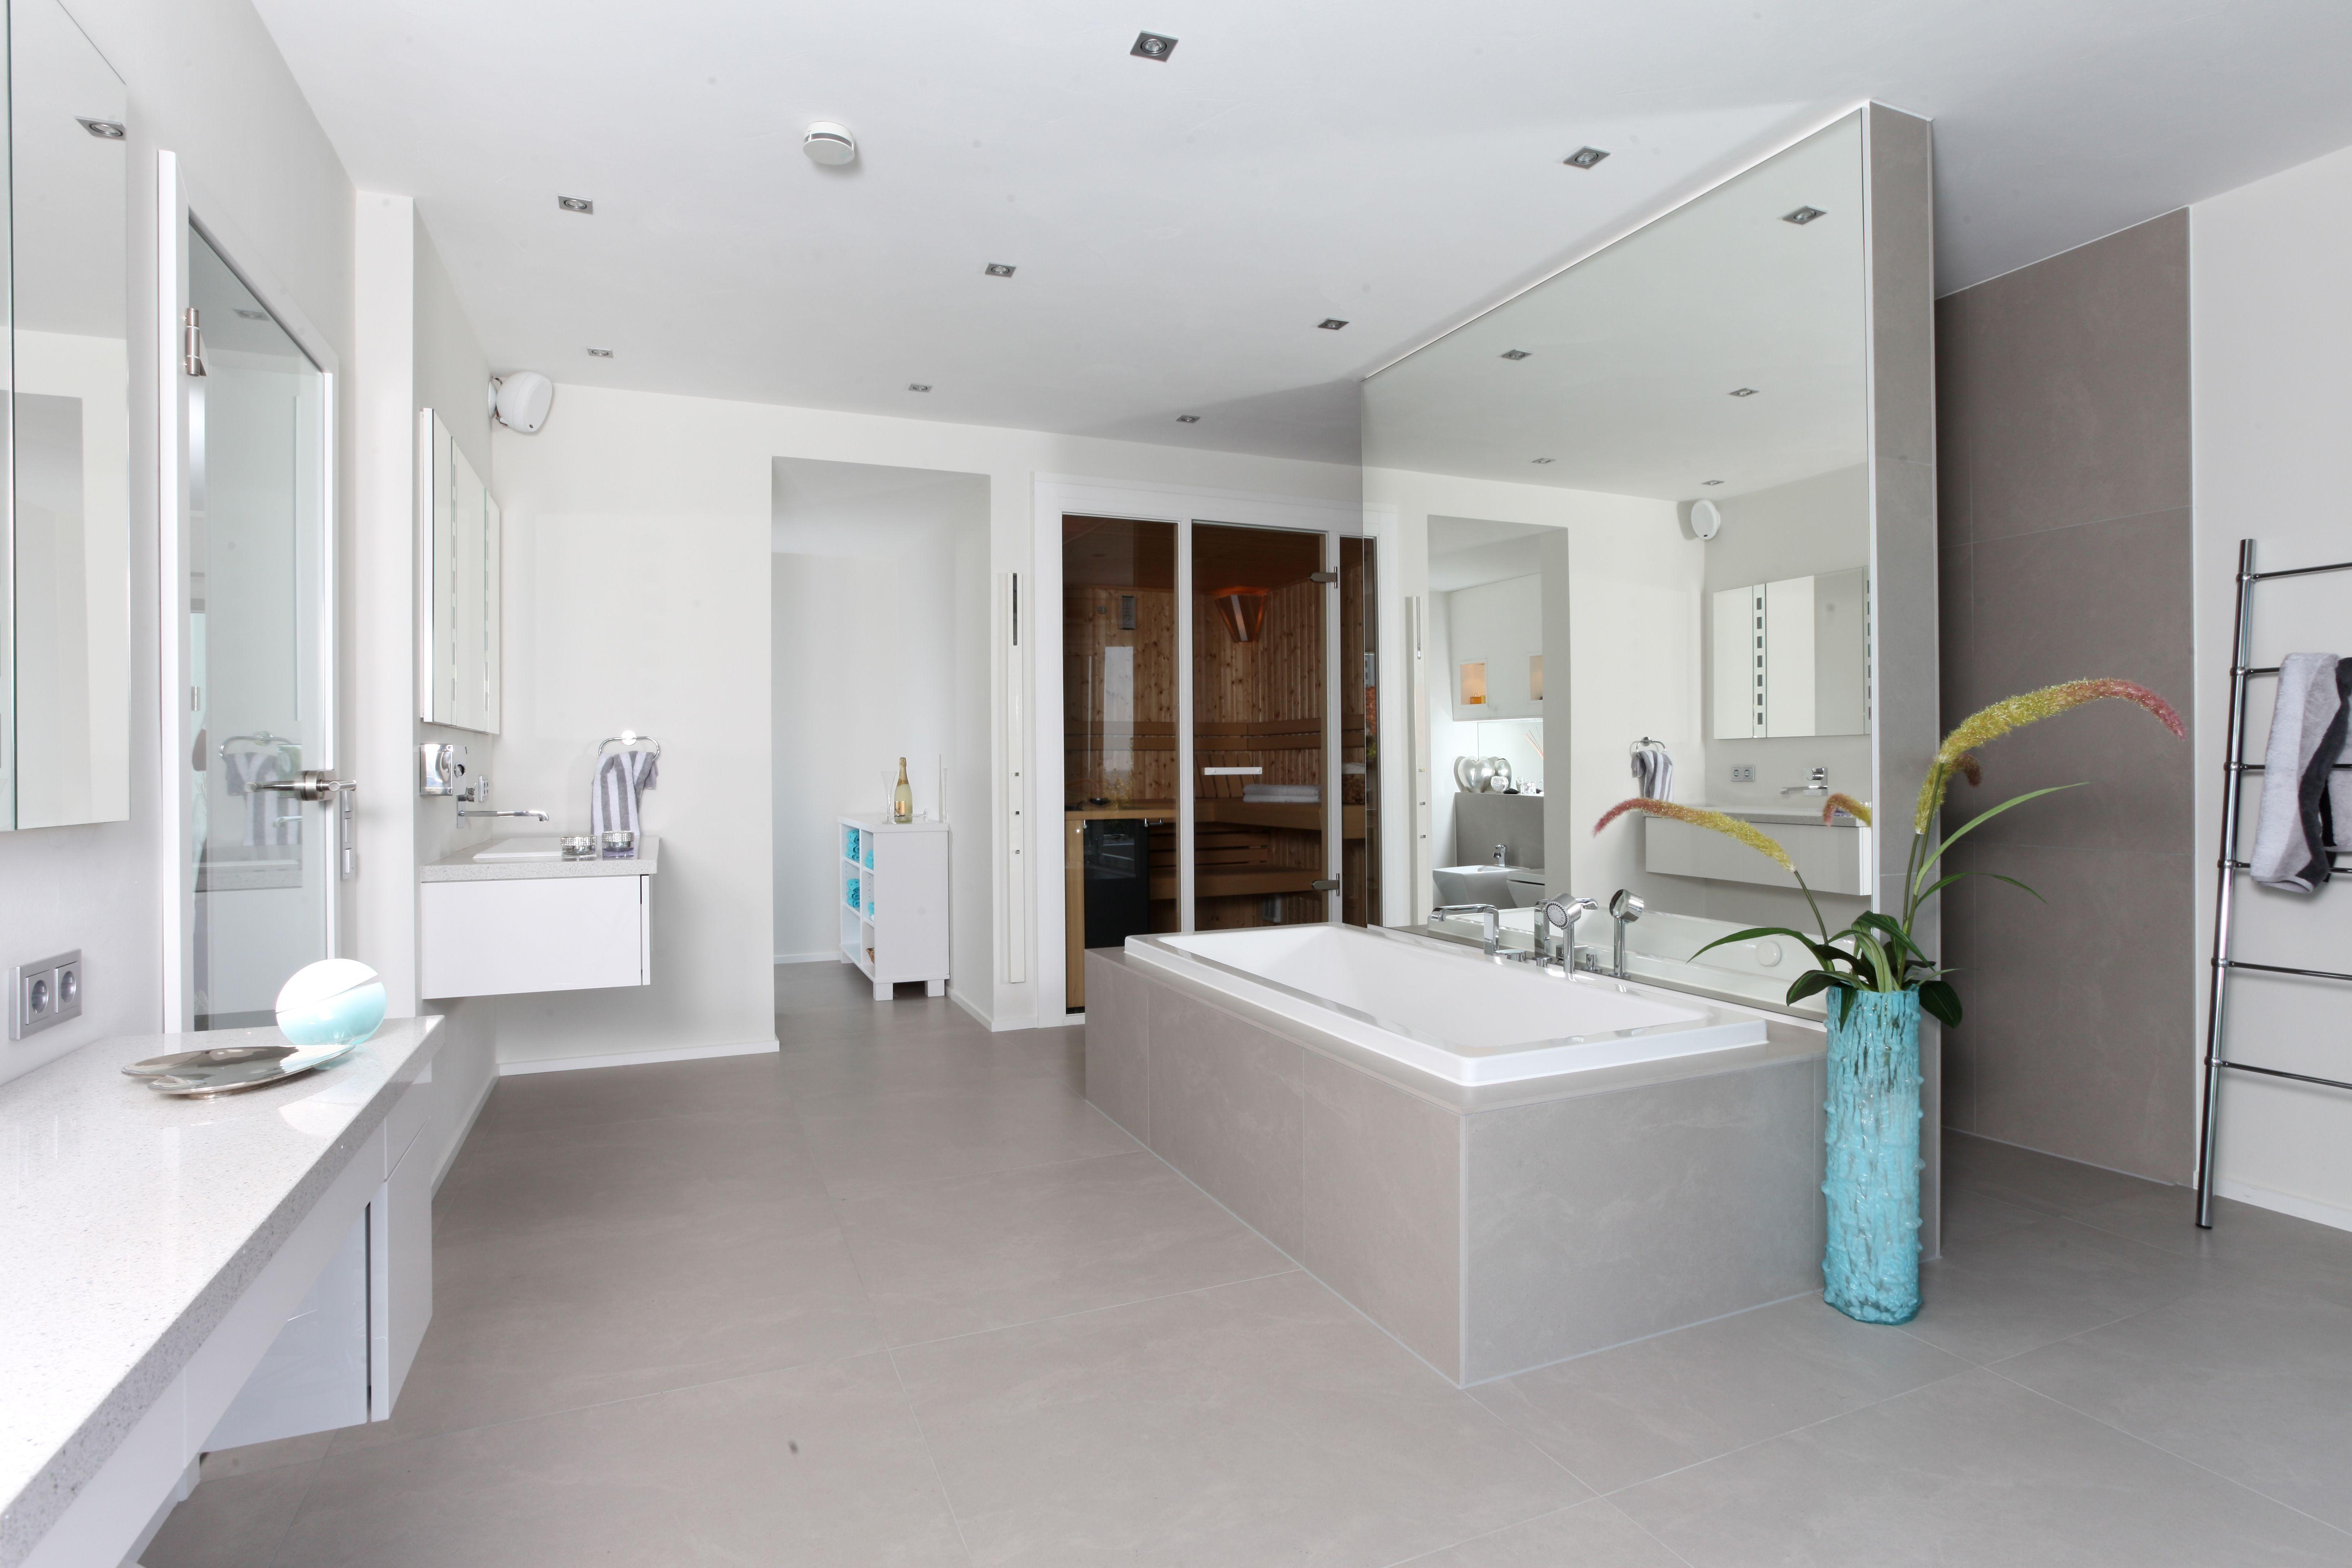 DAVINCI HAUS Badezimmer Bathroom